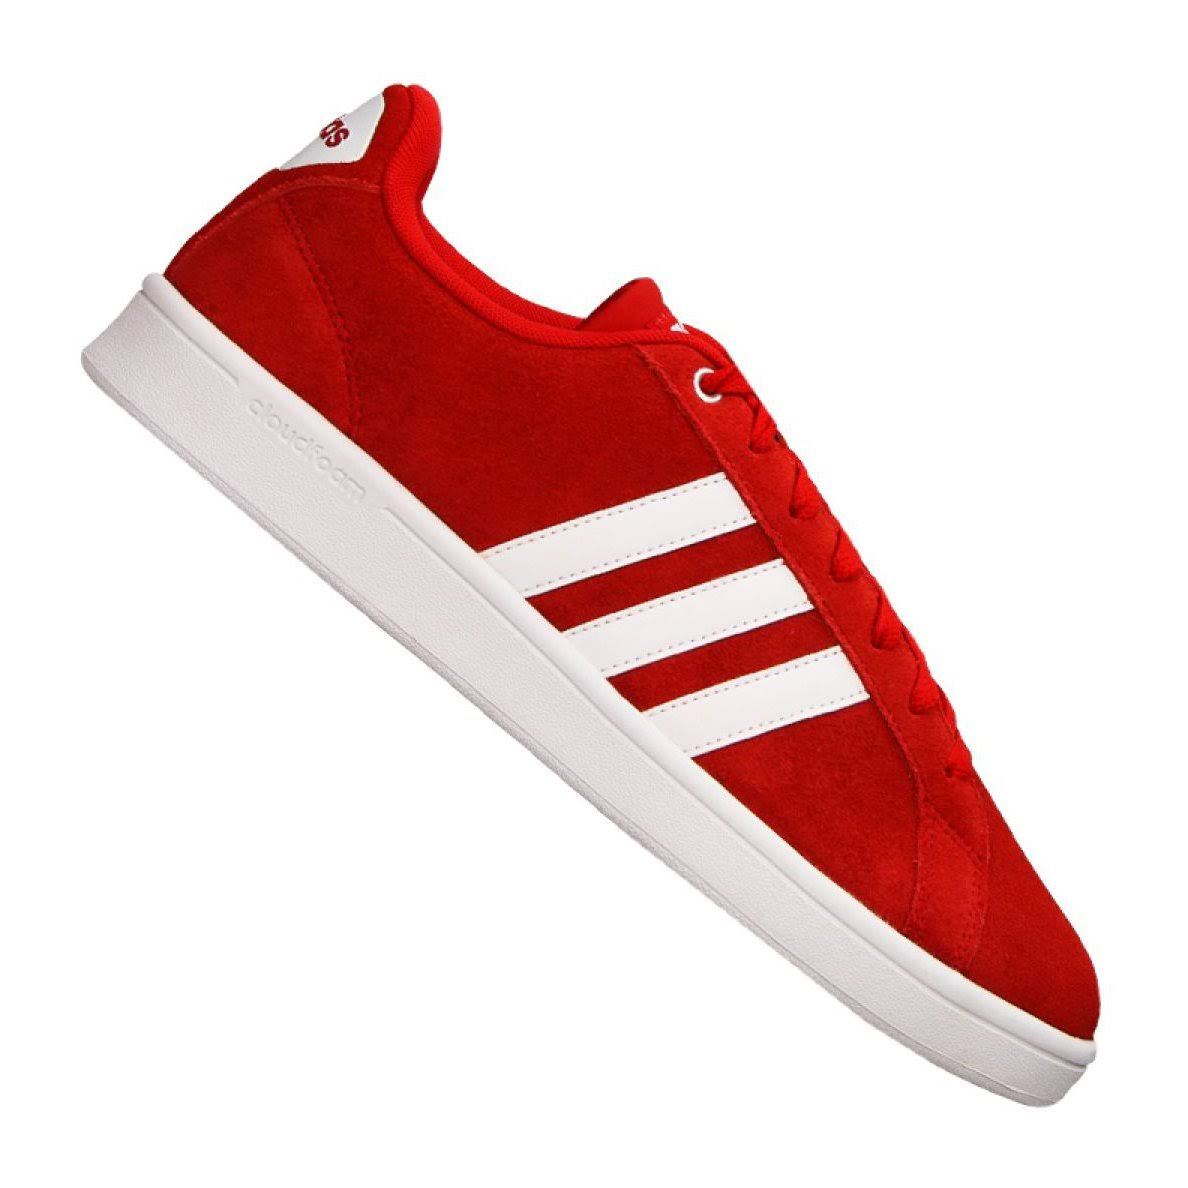 Adidas CF Advantage bb9597 Men Shoes Universal Red